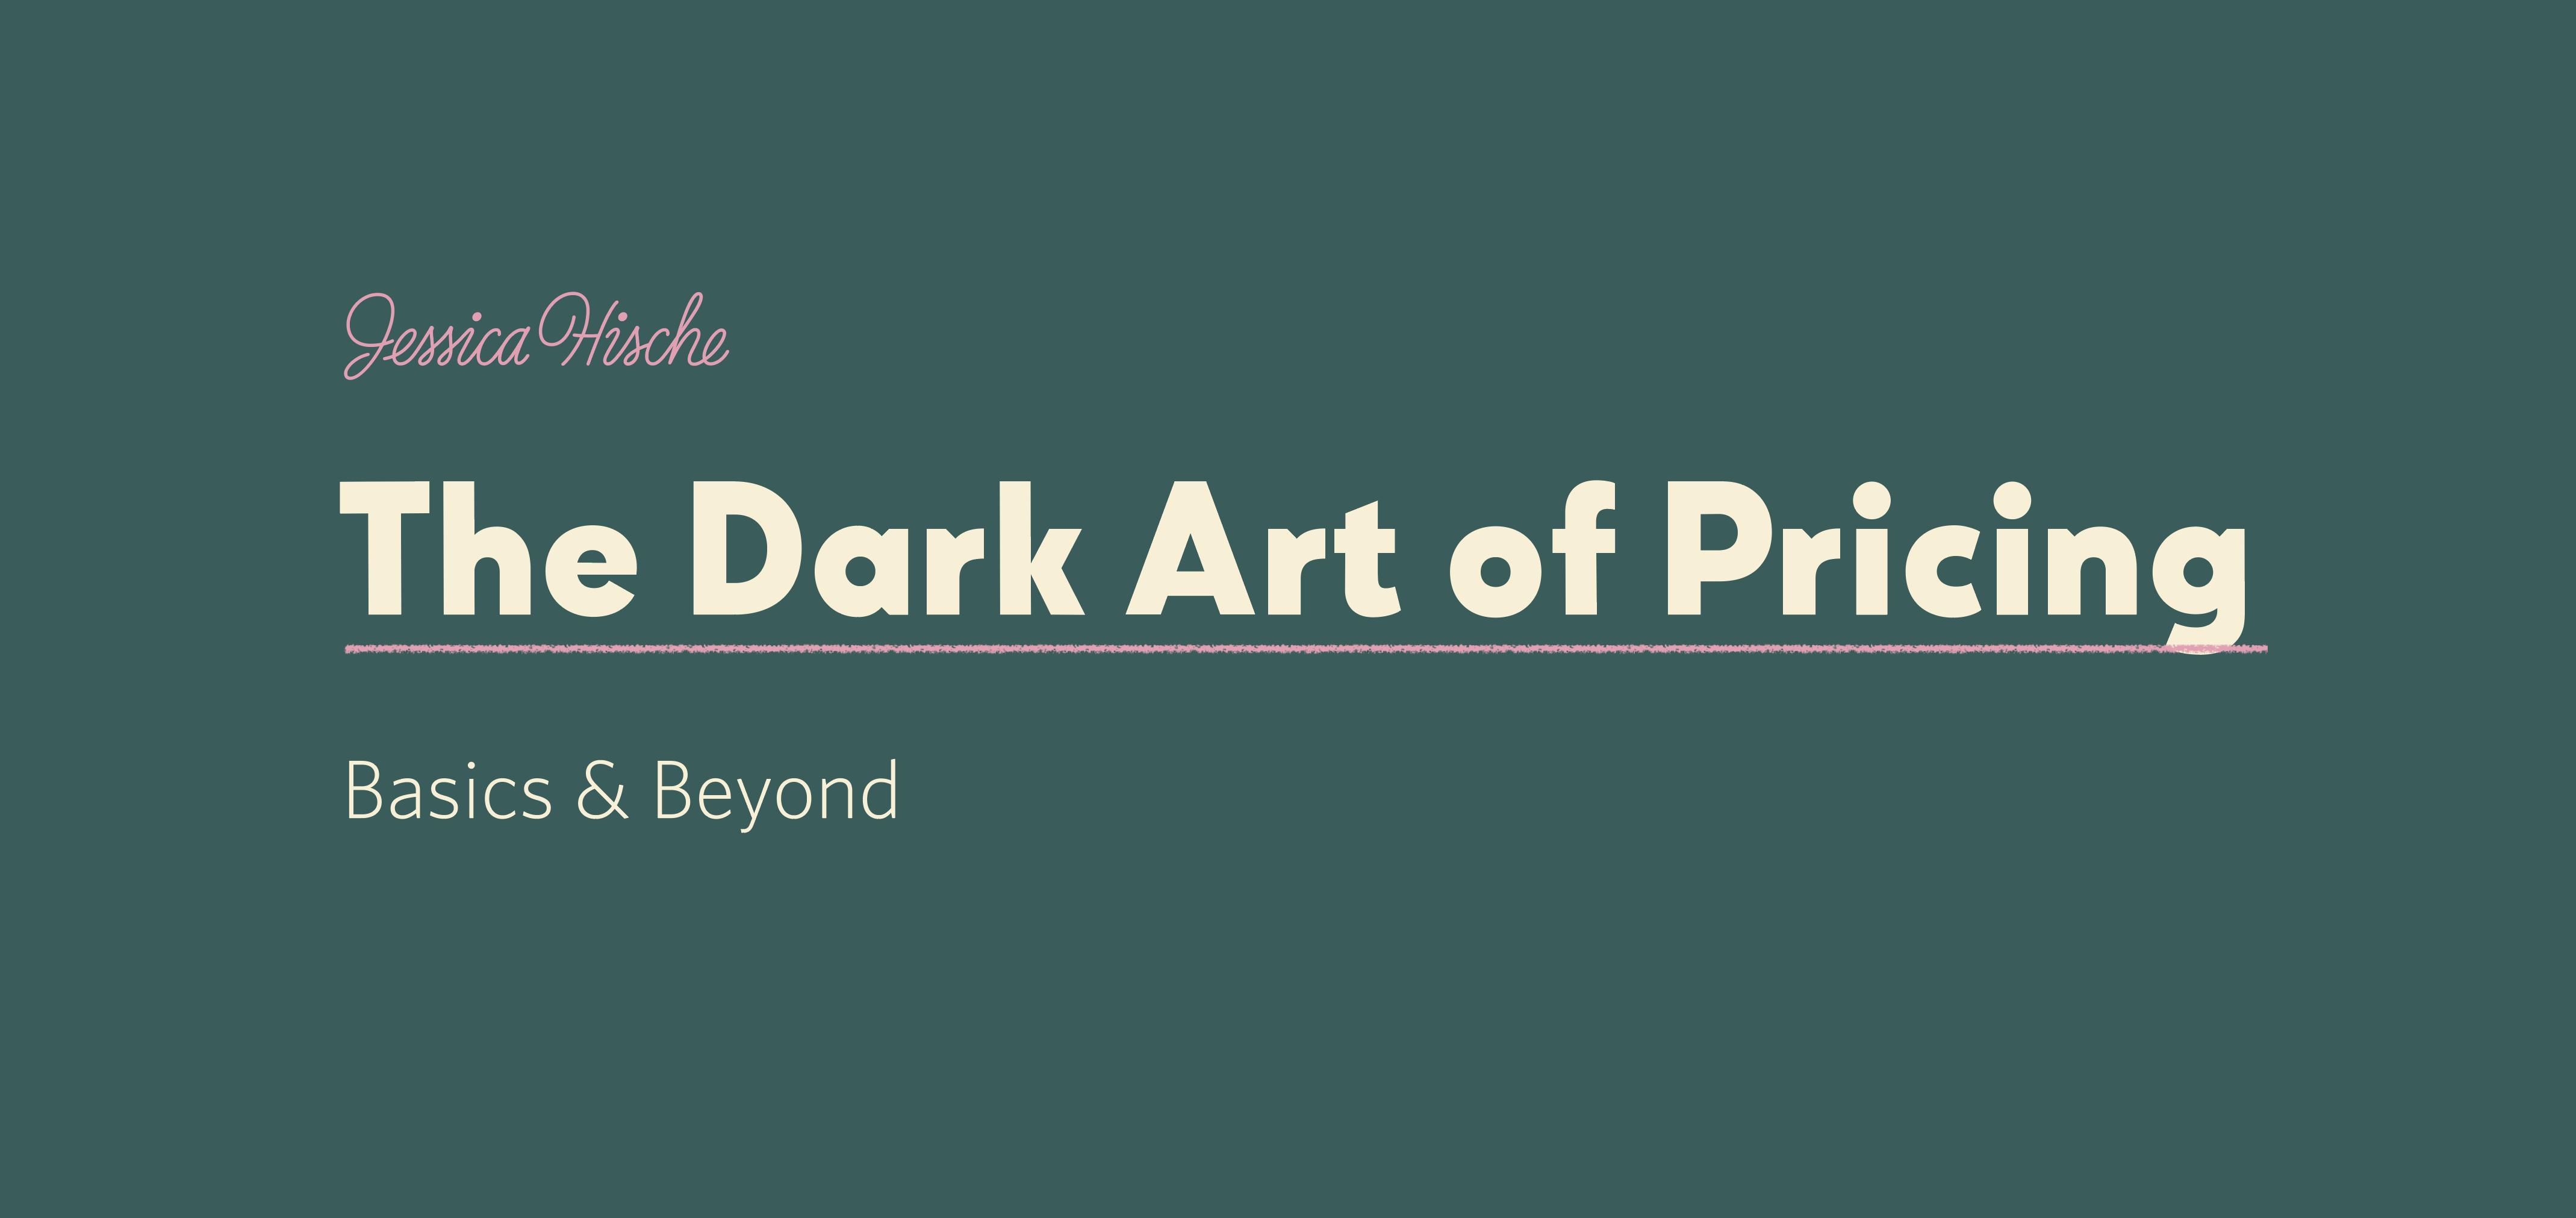 The Dark Art of Pricing: Basics & Beyond